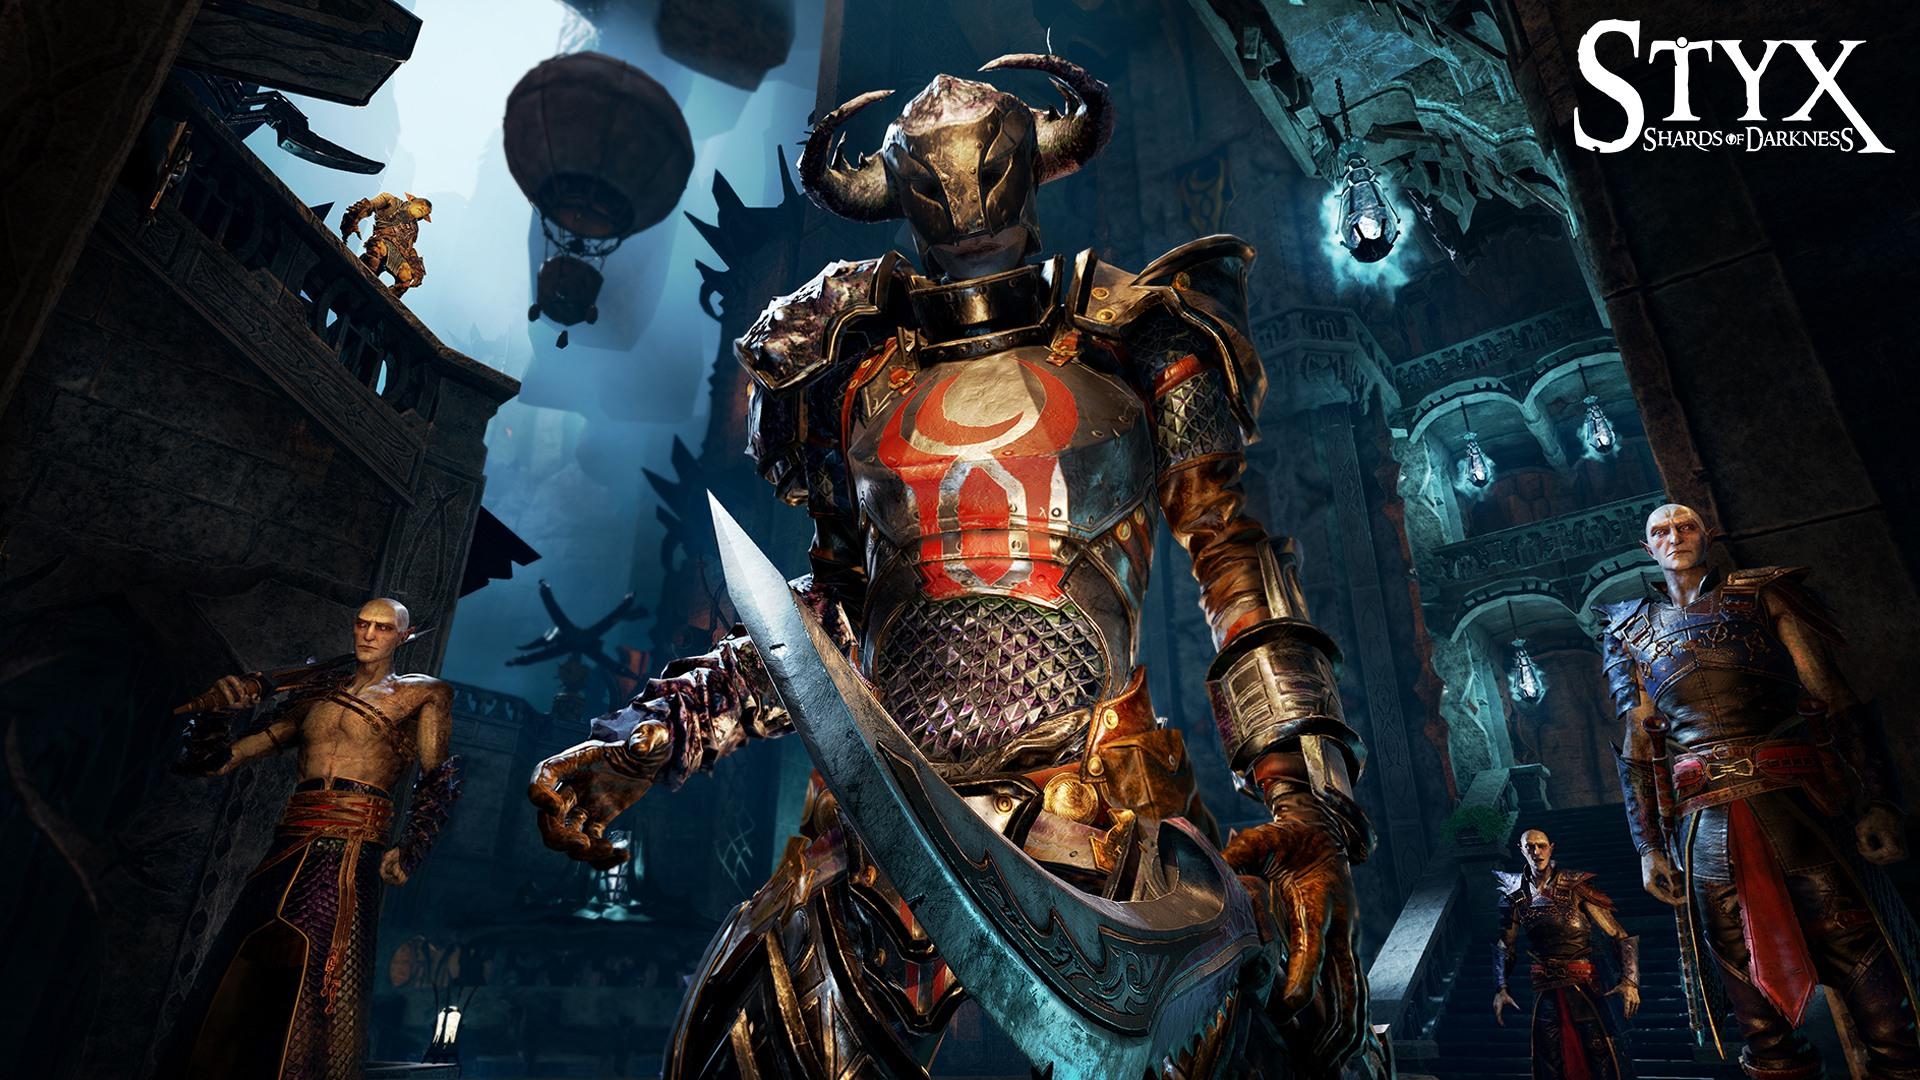 General 1920x1080 video games fantasy art warrior sword armour